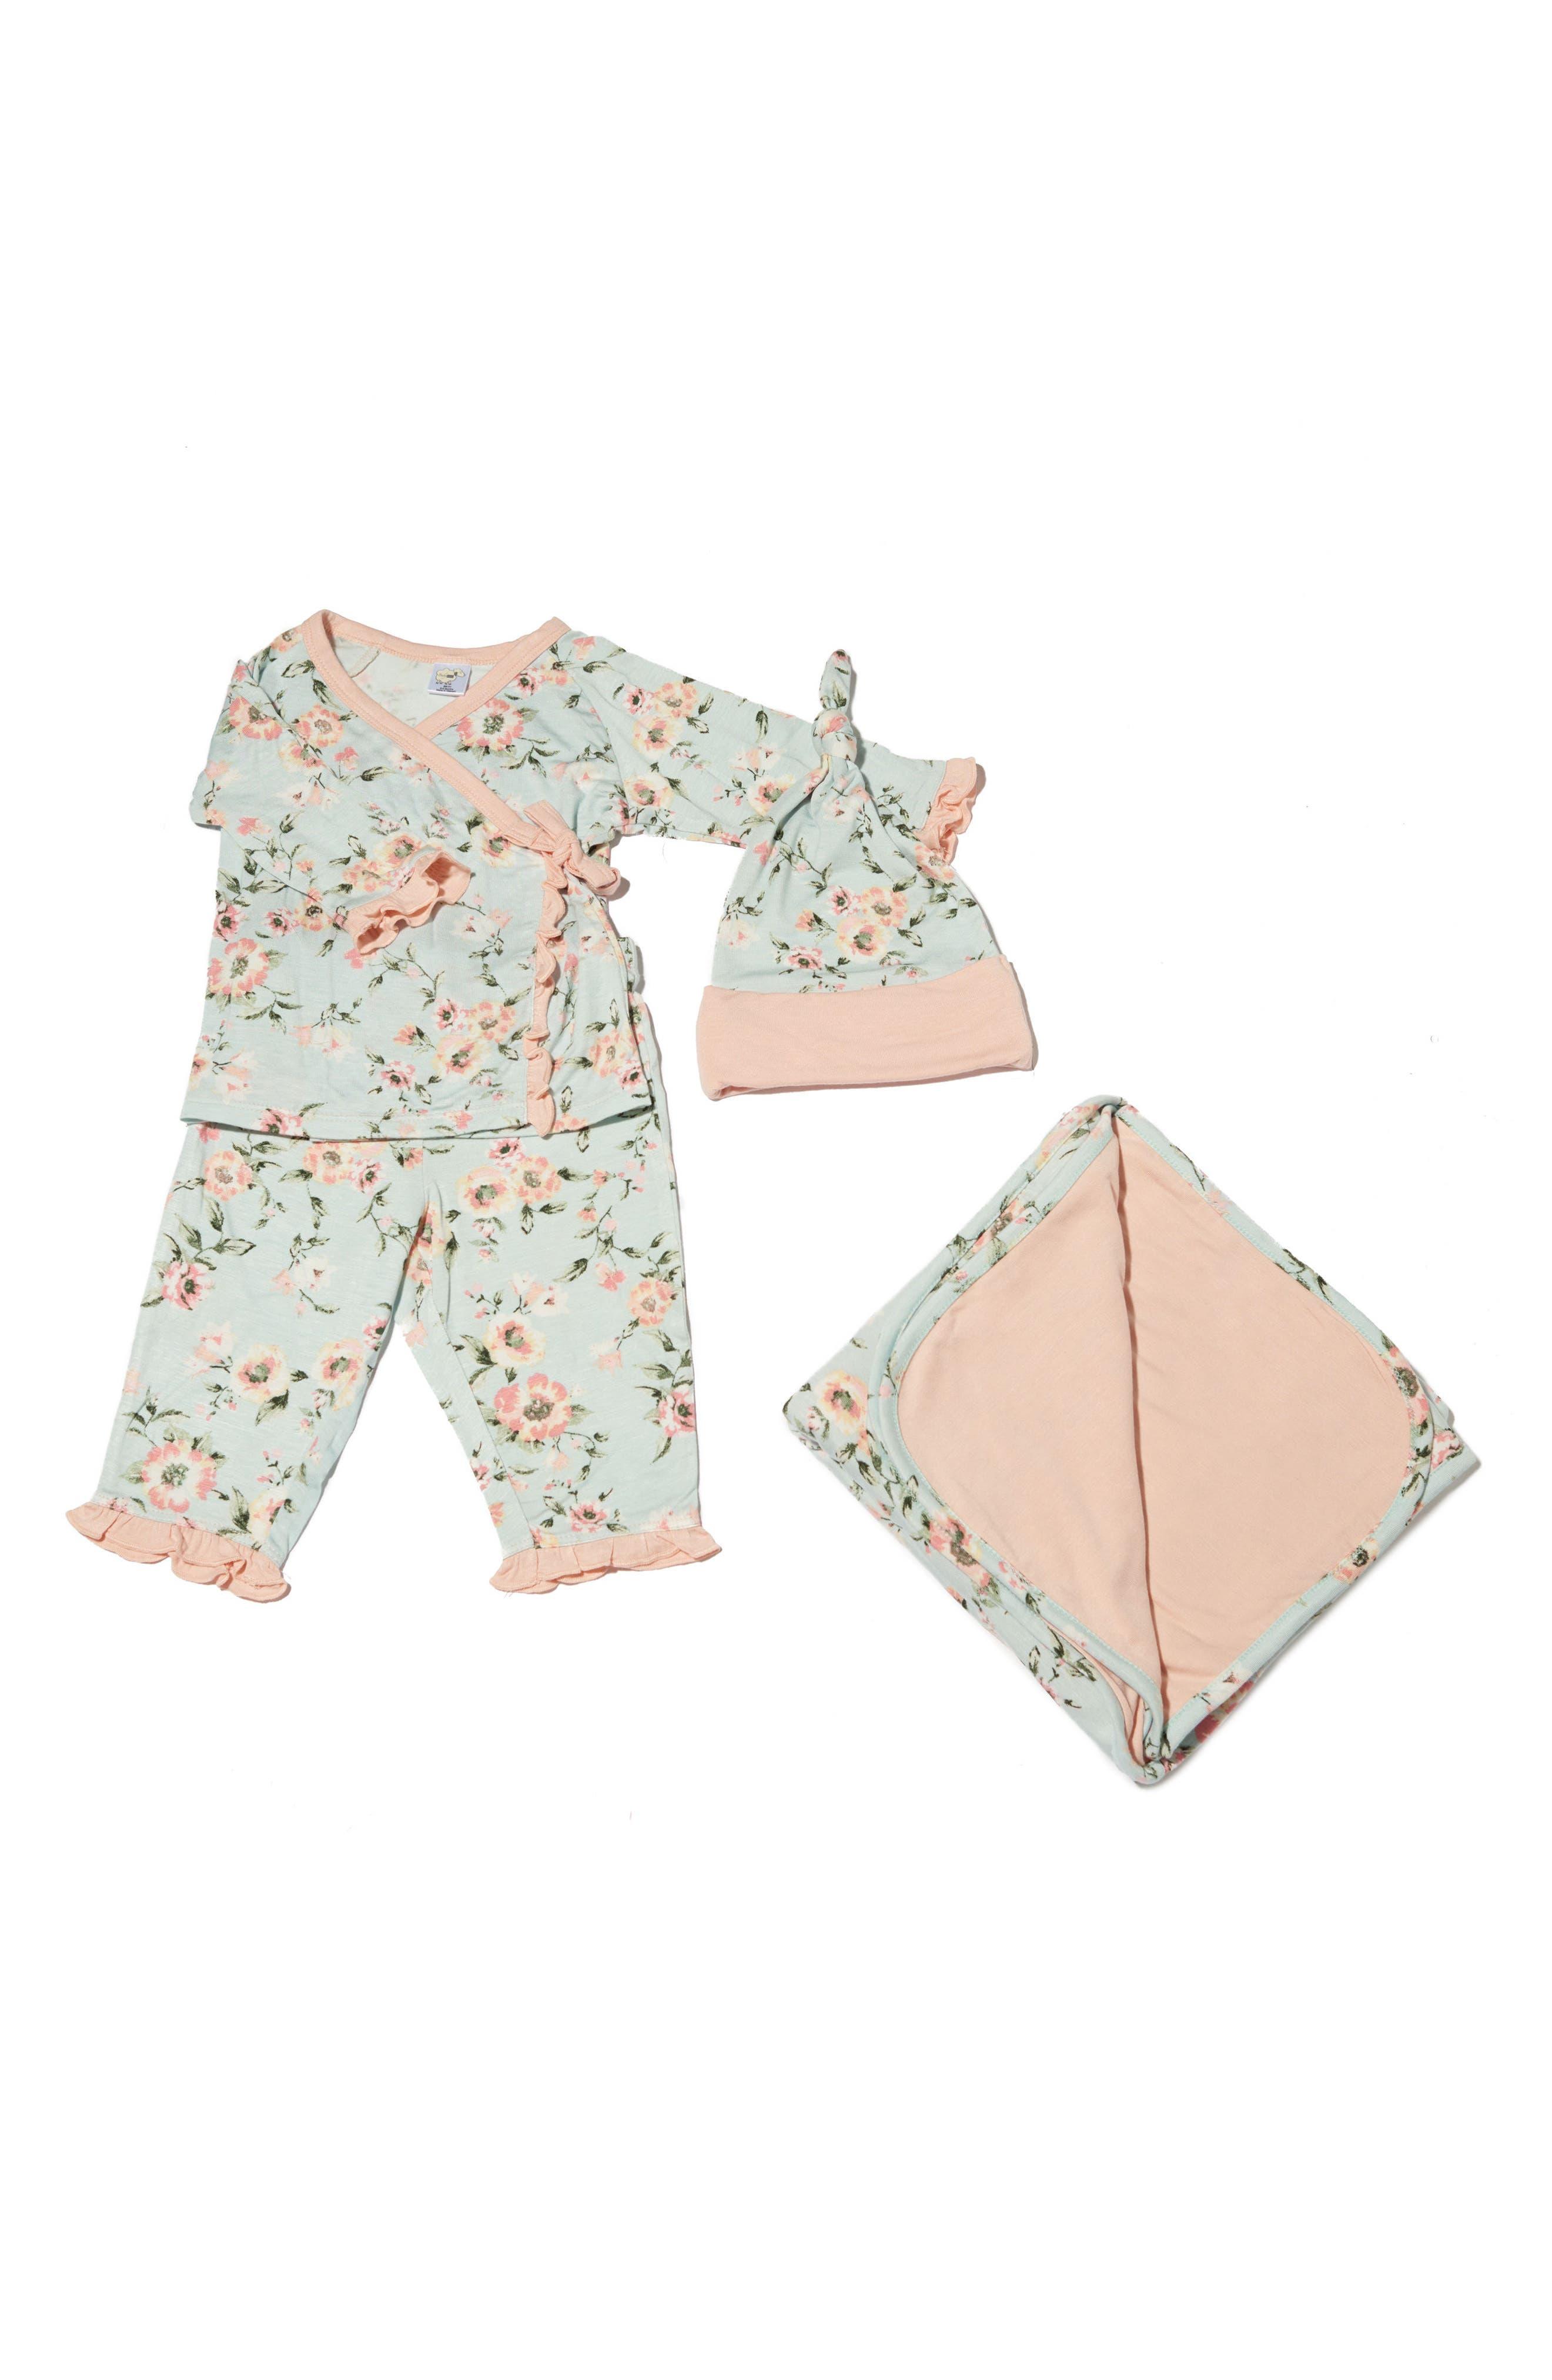 Ruffle Kimono Top, Pants, Hat & Receiving Blanket Set,                         Main,                         color, 451